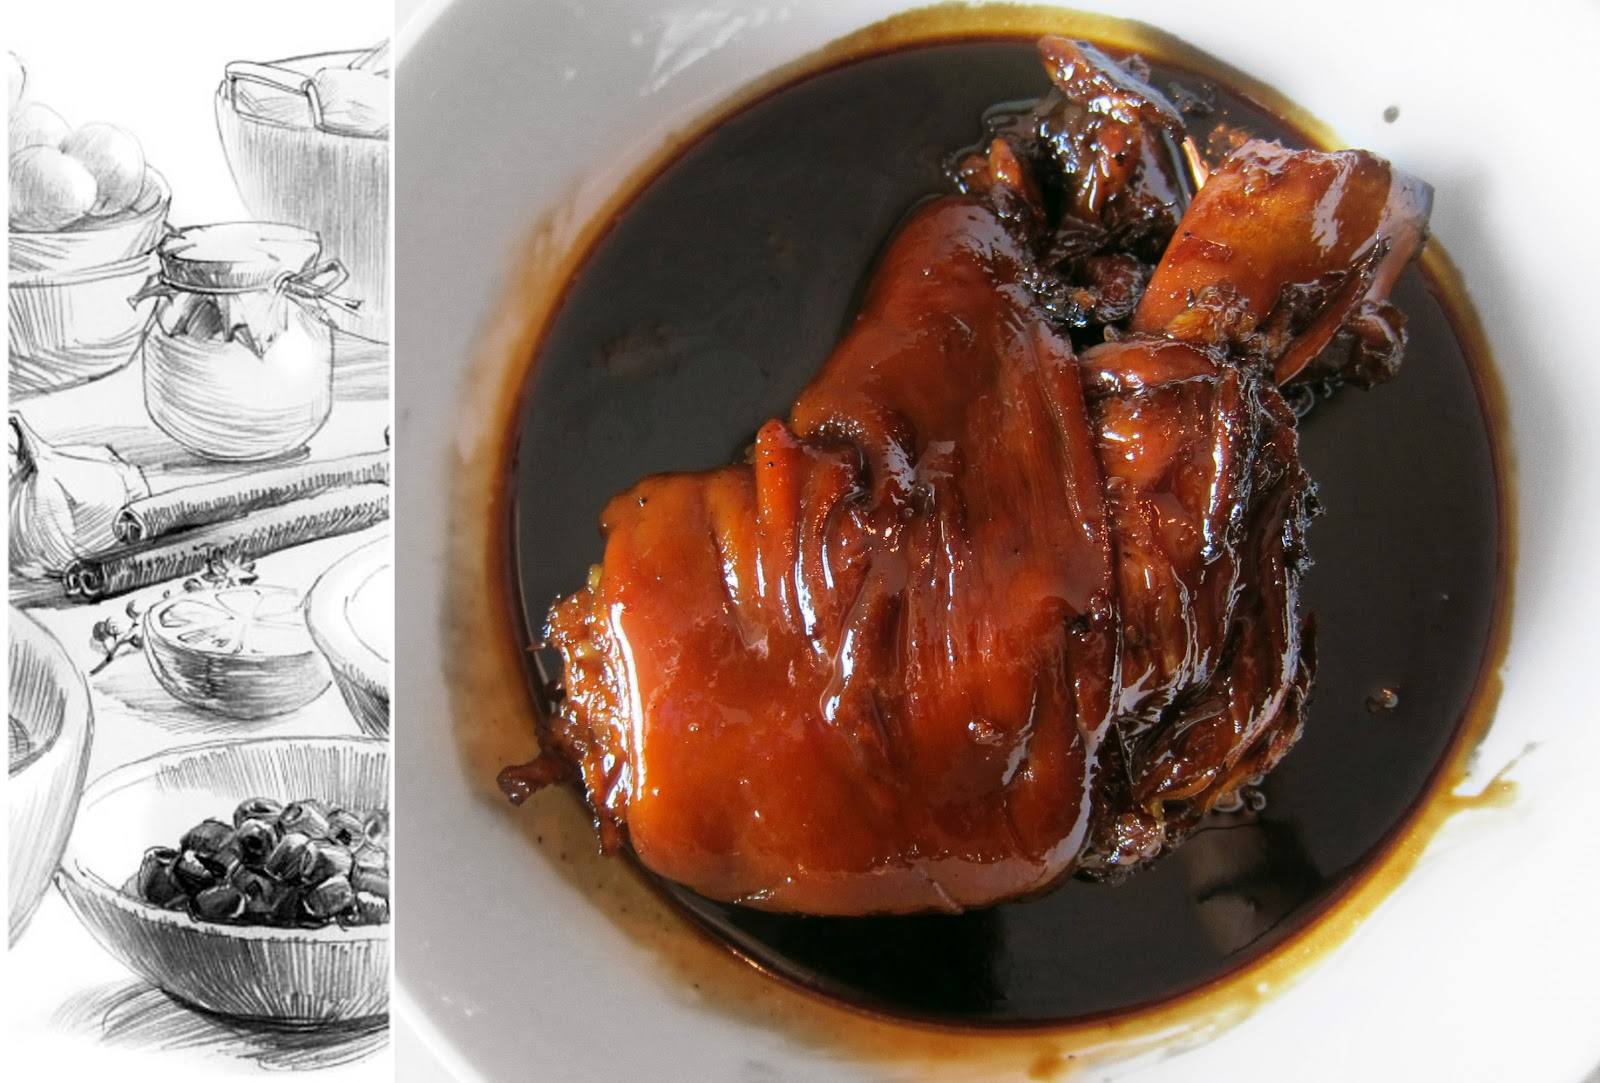 Foodmanna: Shanghai Red Cooked Pork Hock 紅燒蹄髈